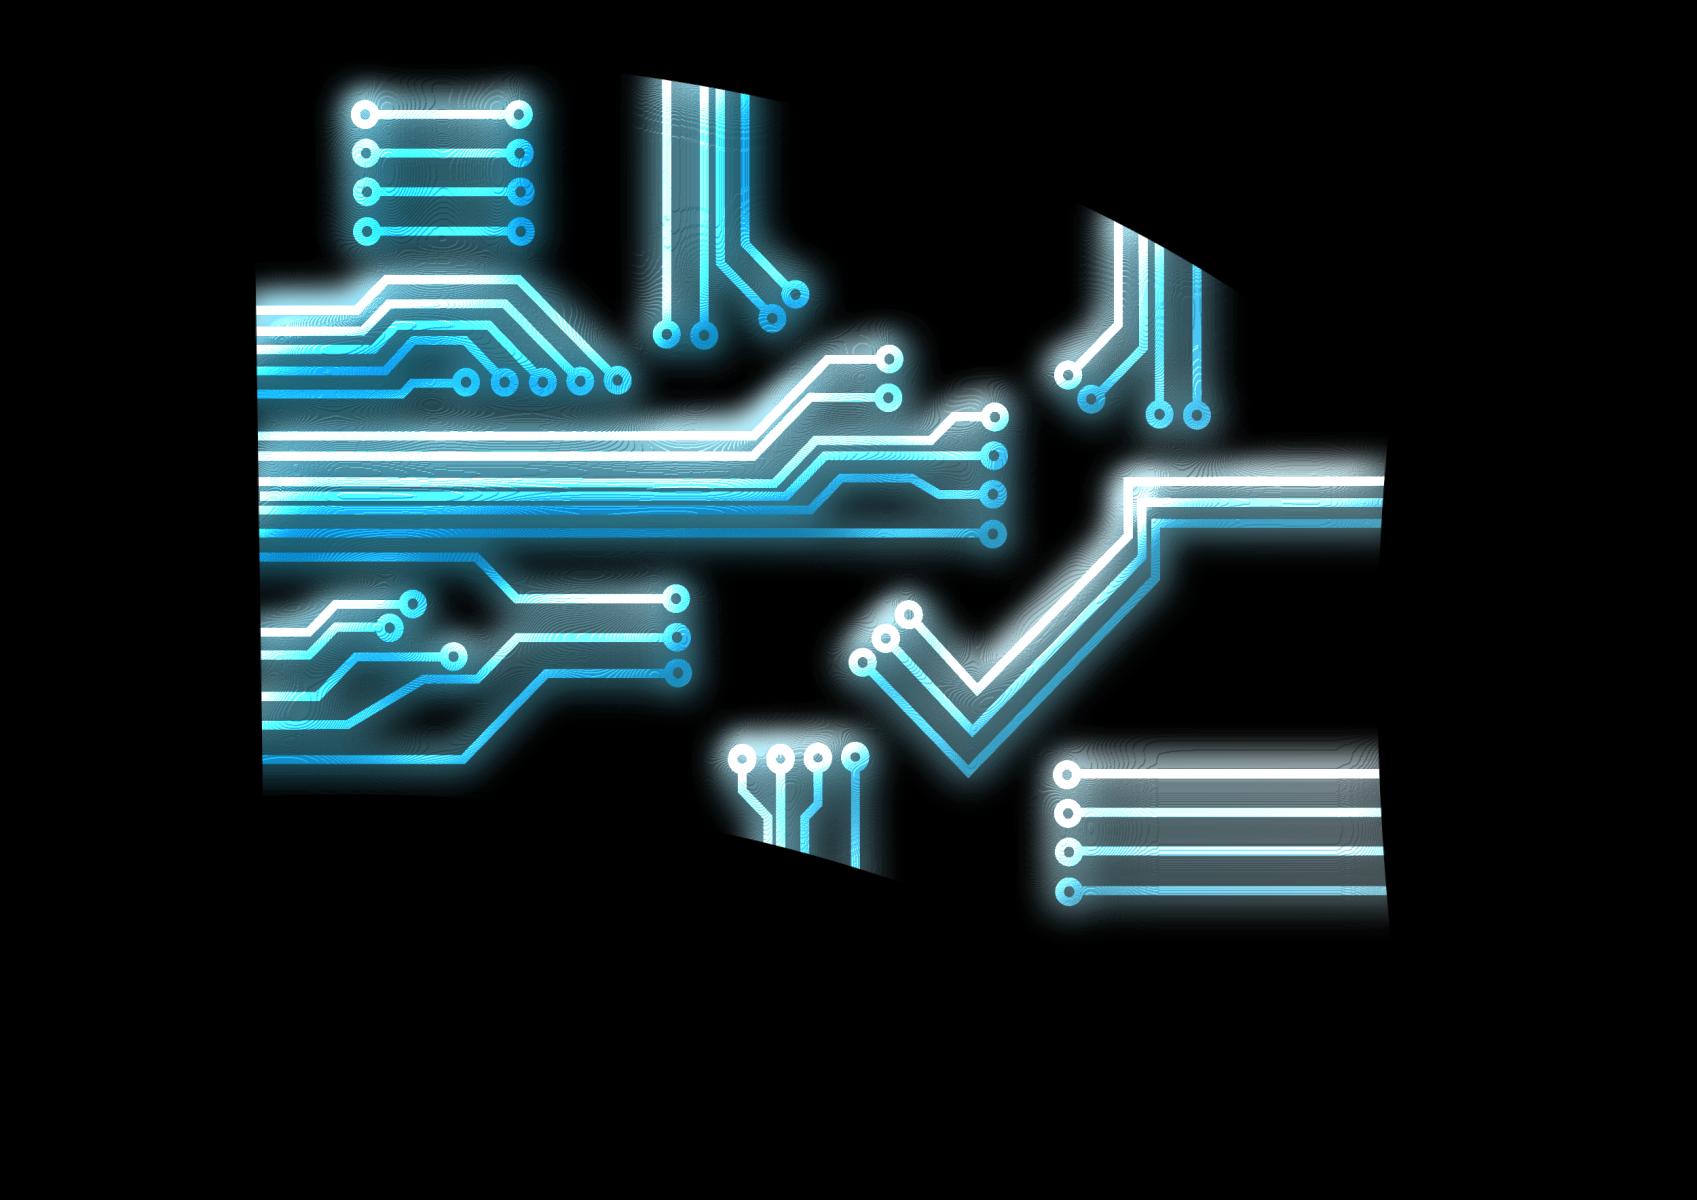 060106s - *36x54 Standard Teal Circuit